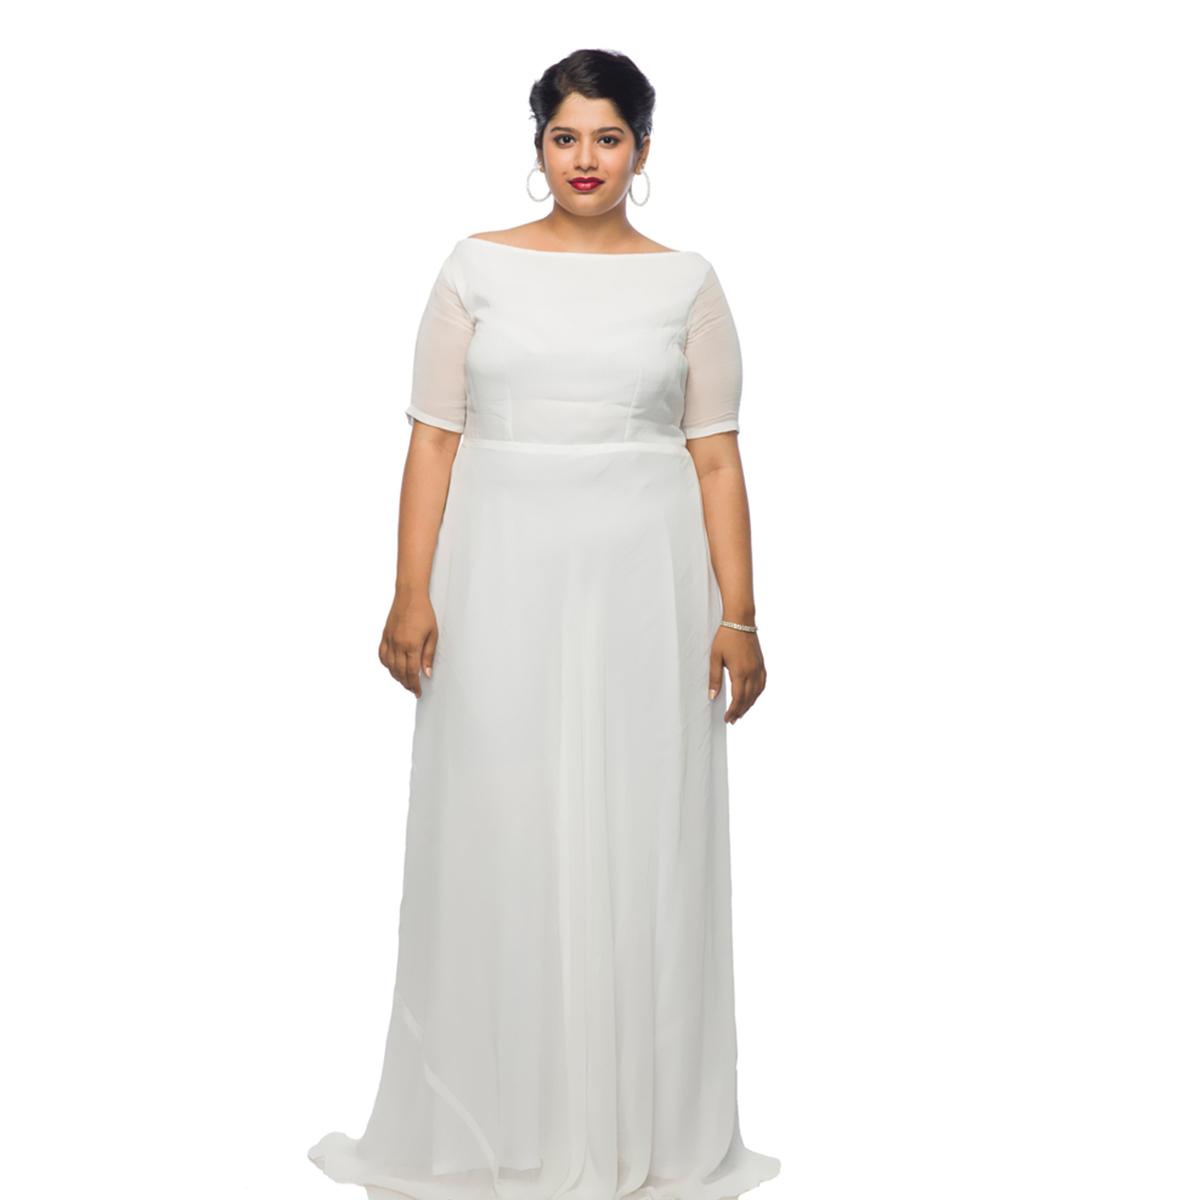 WOMEN, Maxi Dresses | XXLLENT Elegant White Maxi Dress